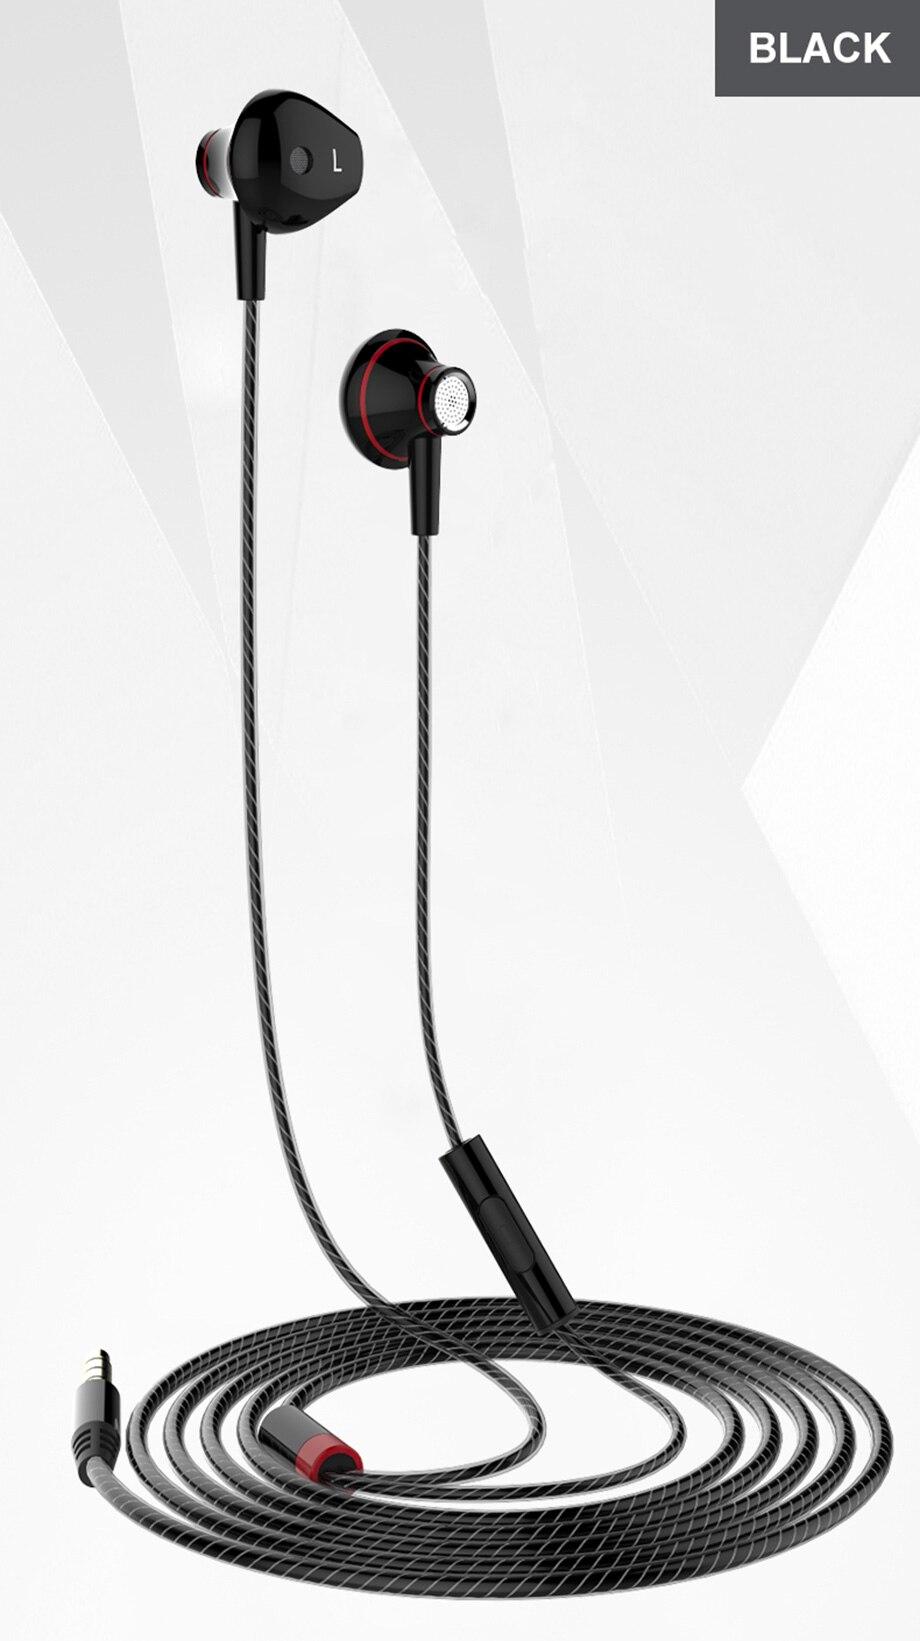 14-in-ear-earphone-headphone-headset-metal-bass-mp3-player-music-mp4-xiaomi-iphone-samsung-ipad-pc-tablet-white-black